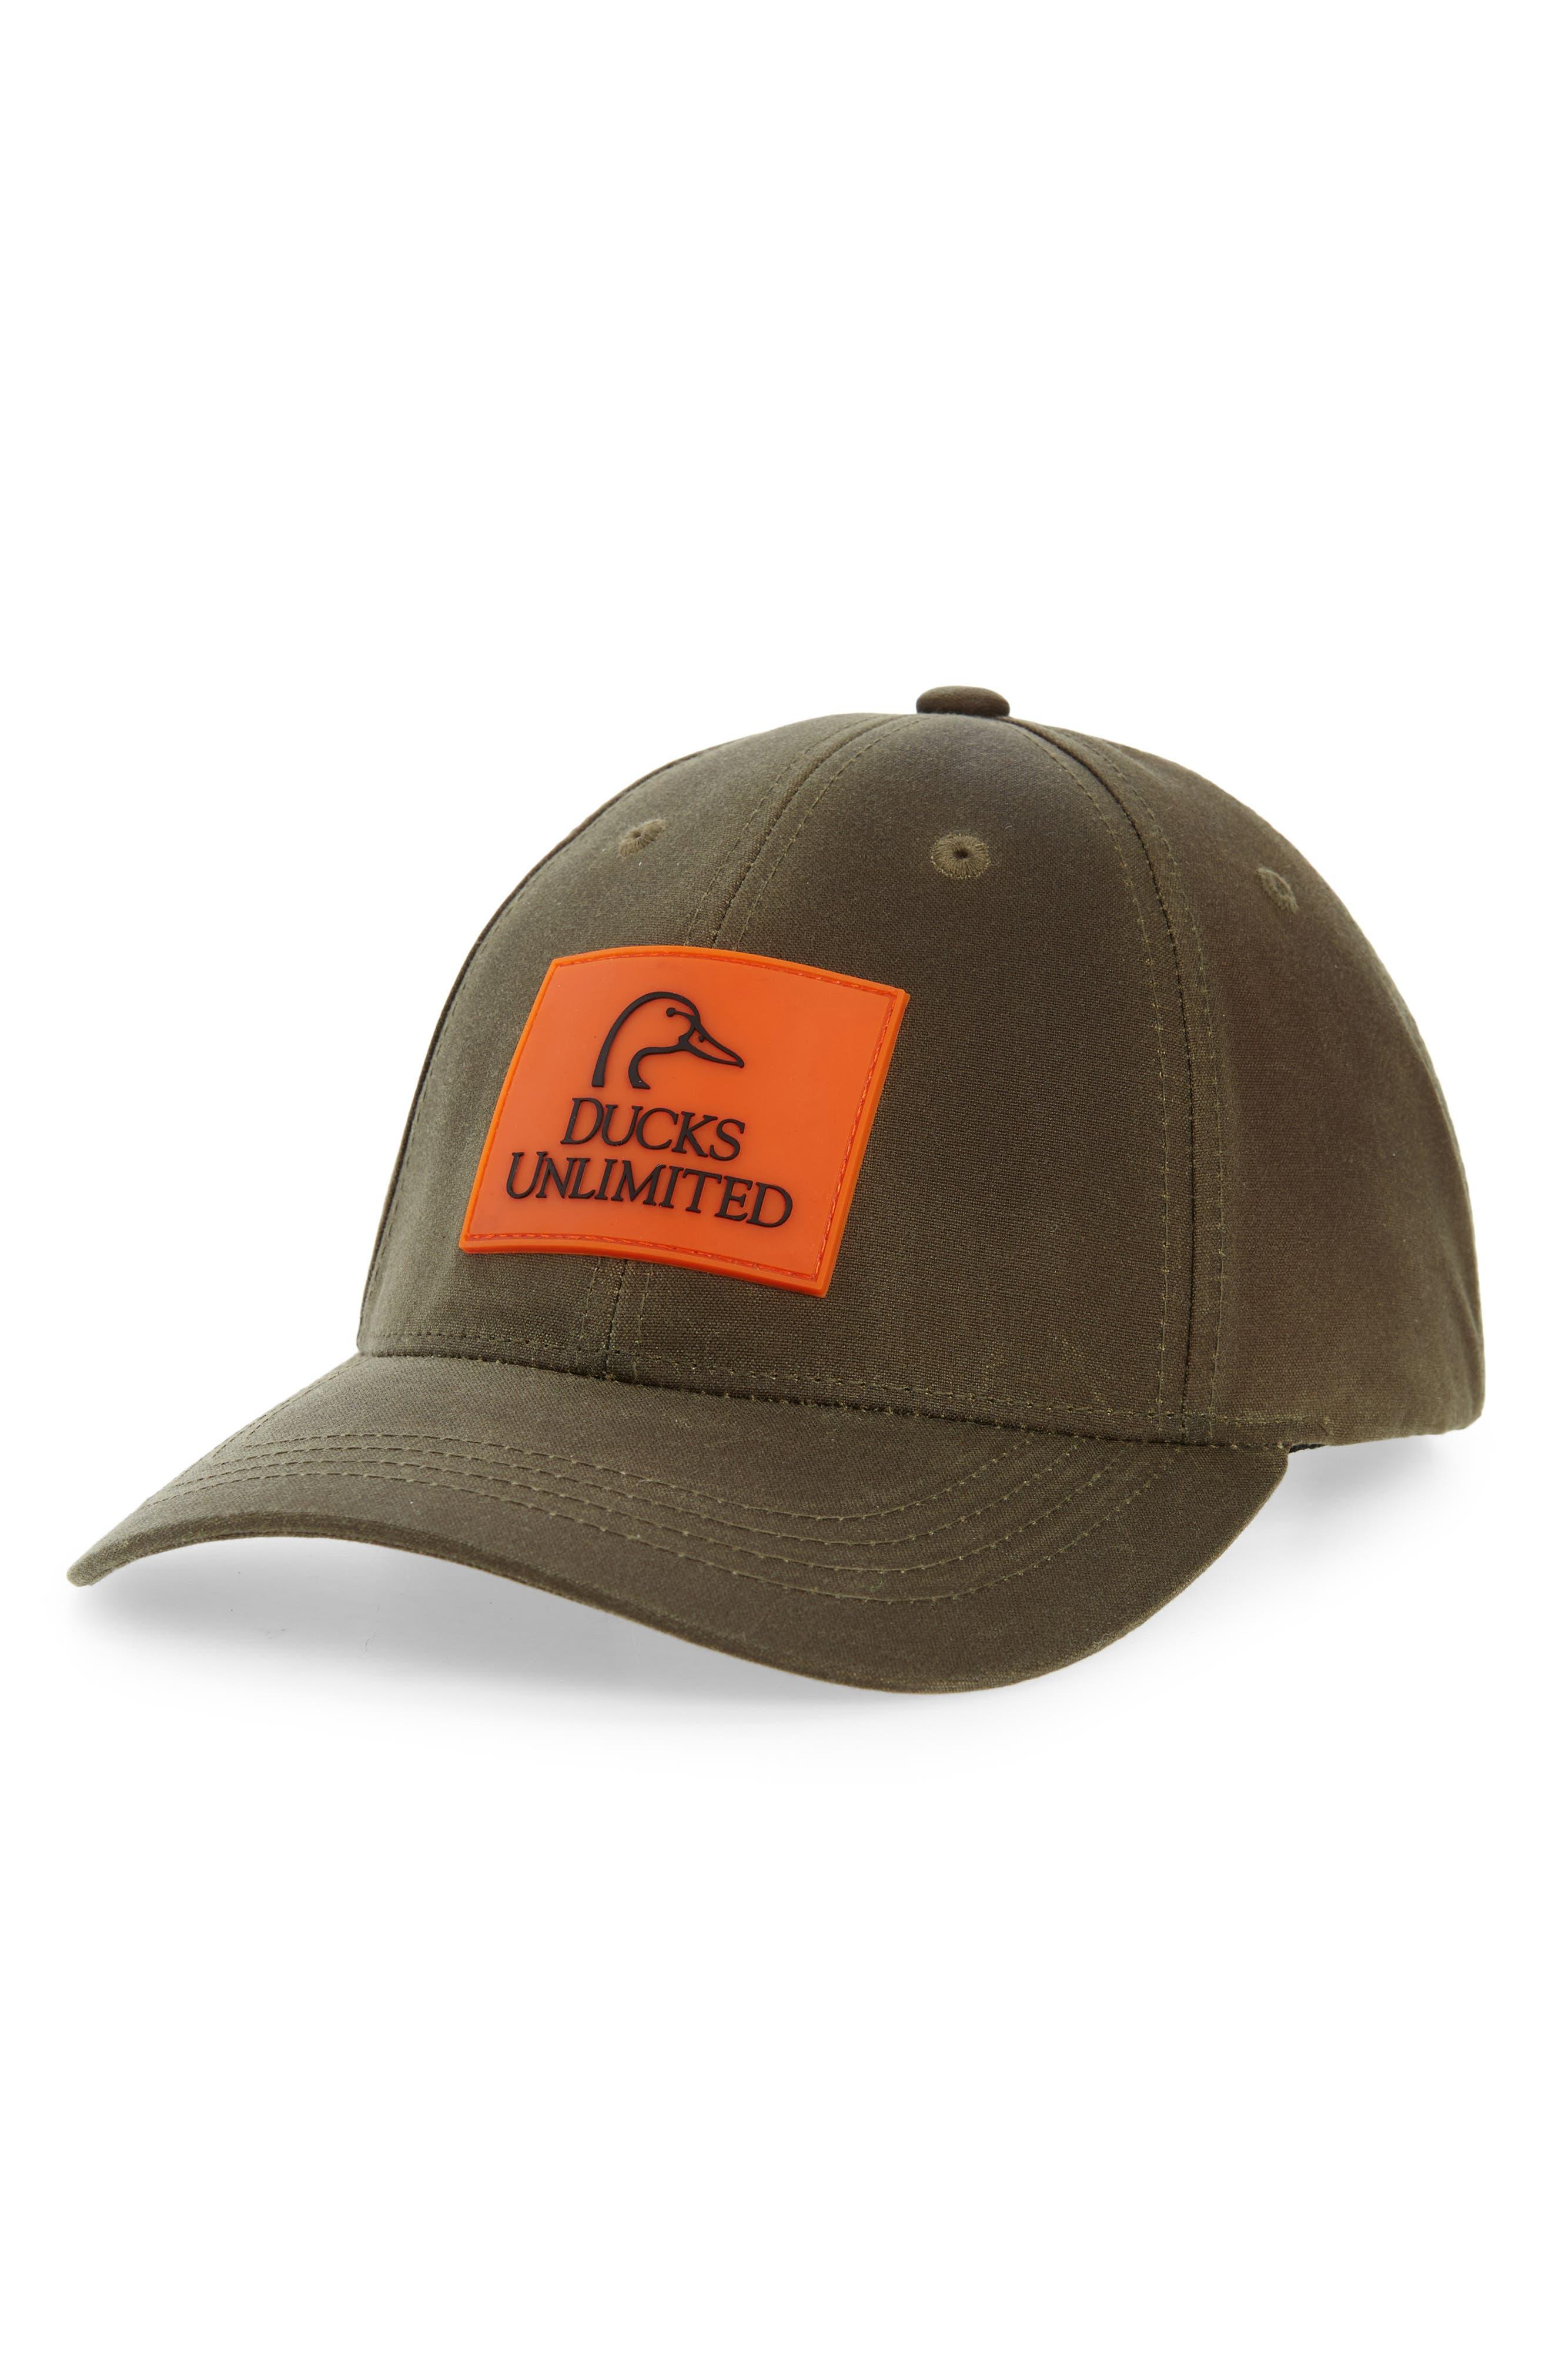 Ducks Unlimited Logger Cap